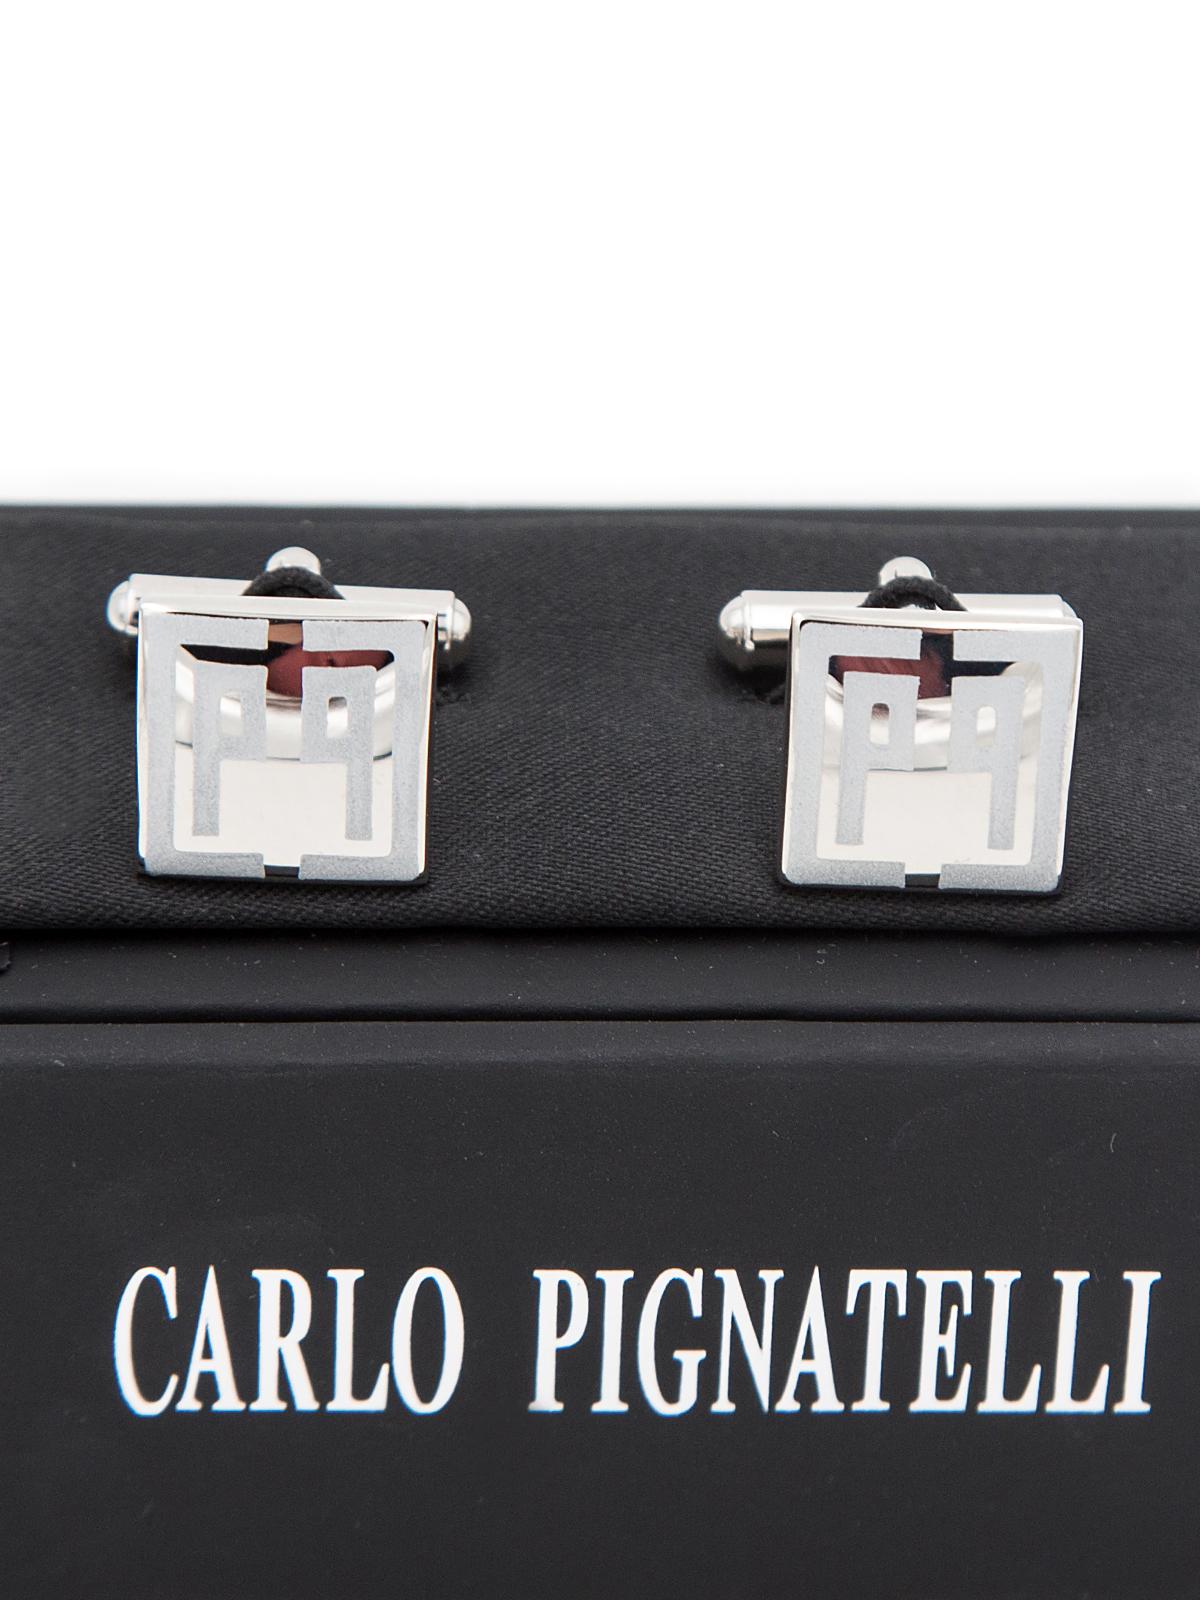 Carlo Pignatelli Gemelli 34AA8194